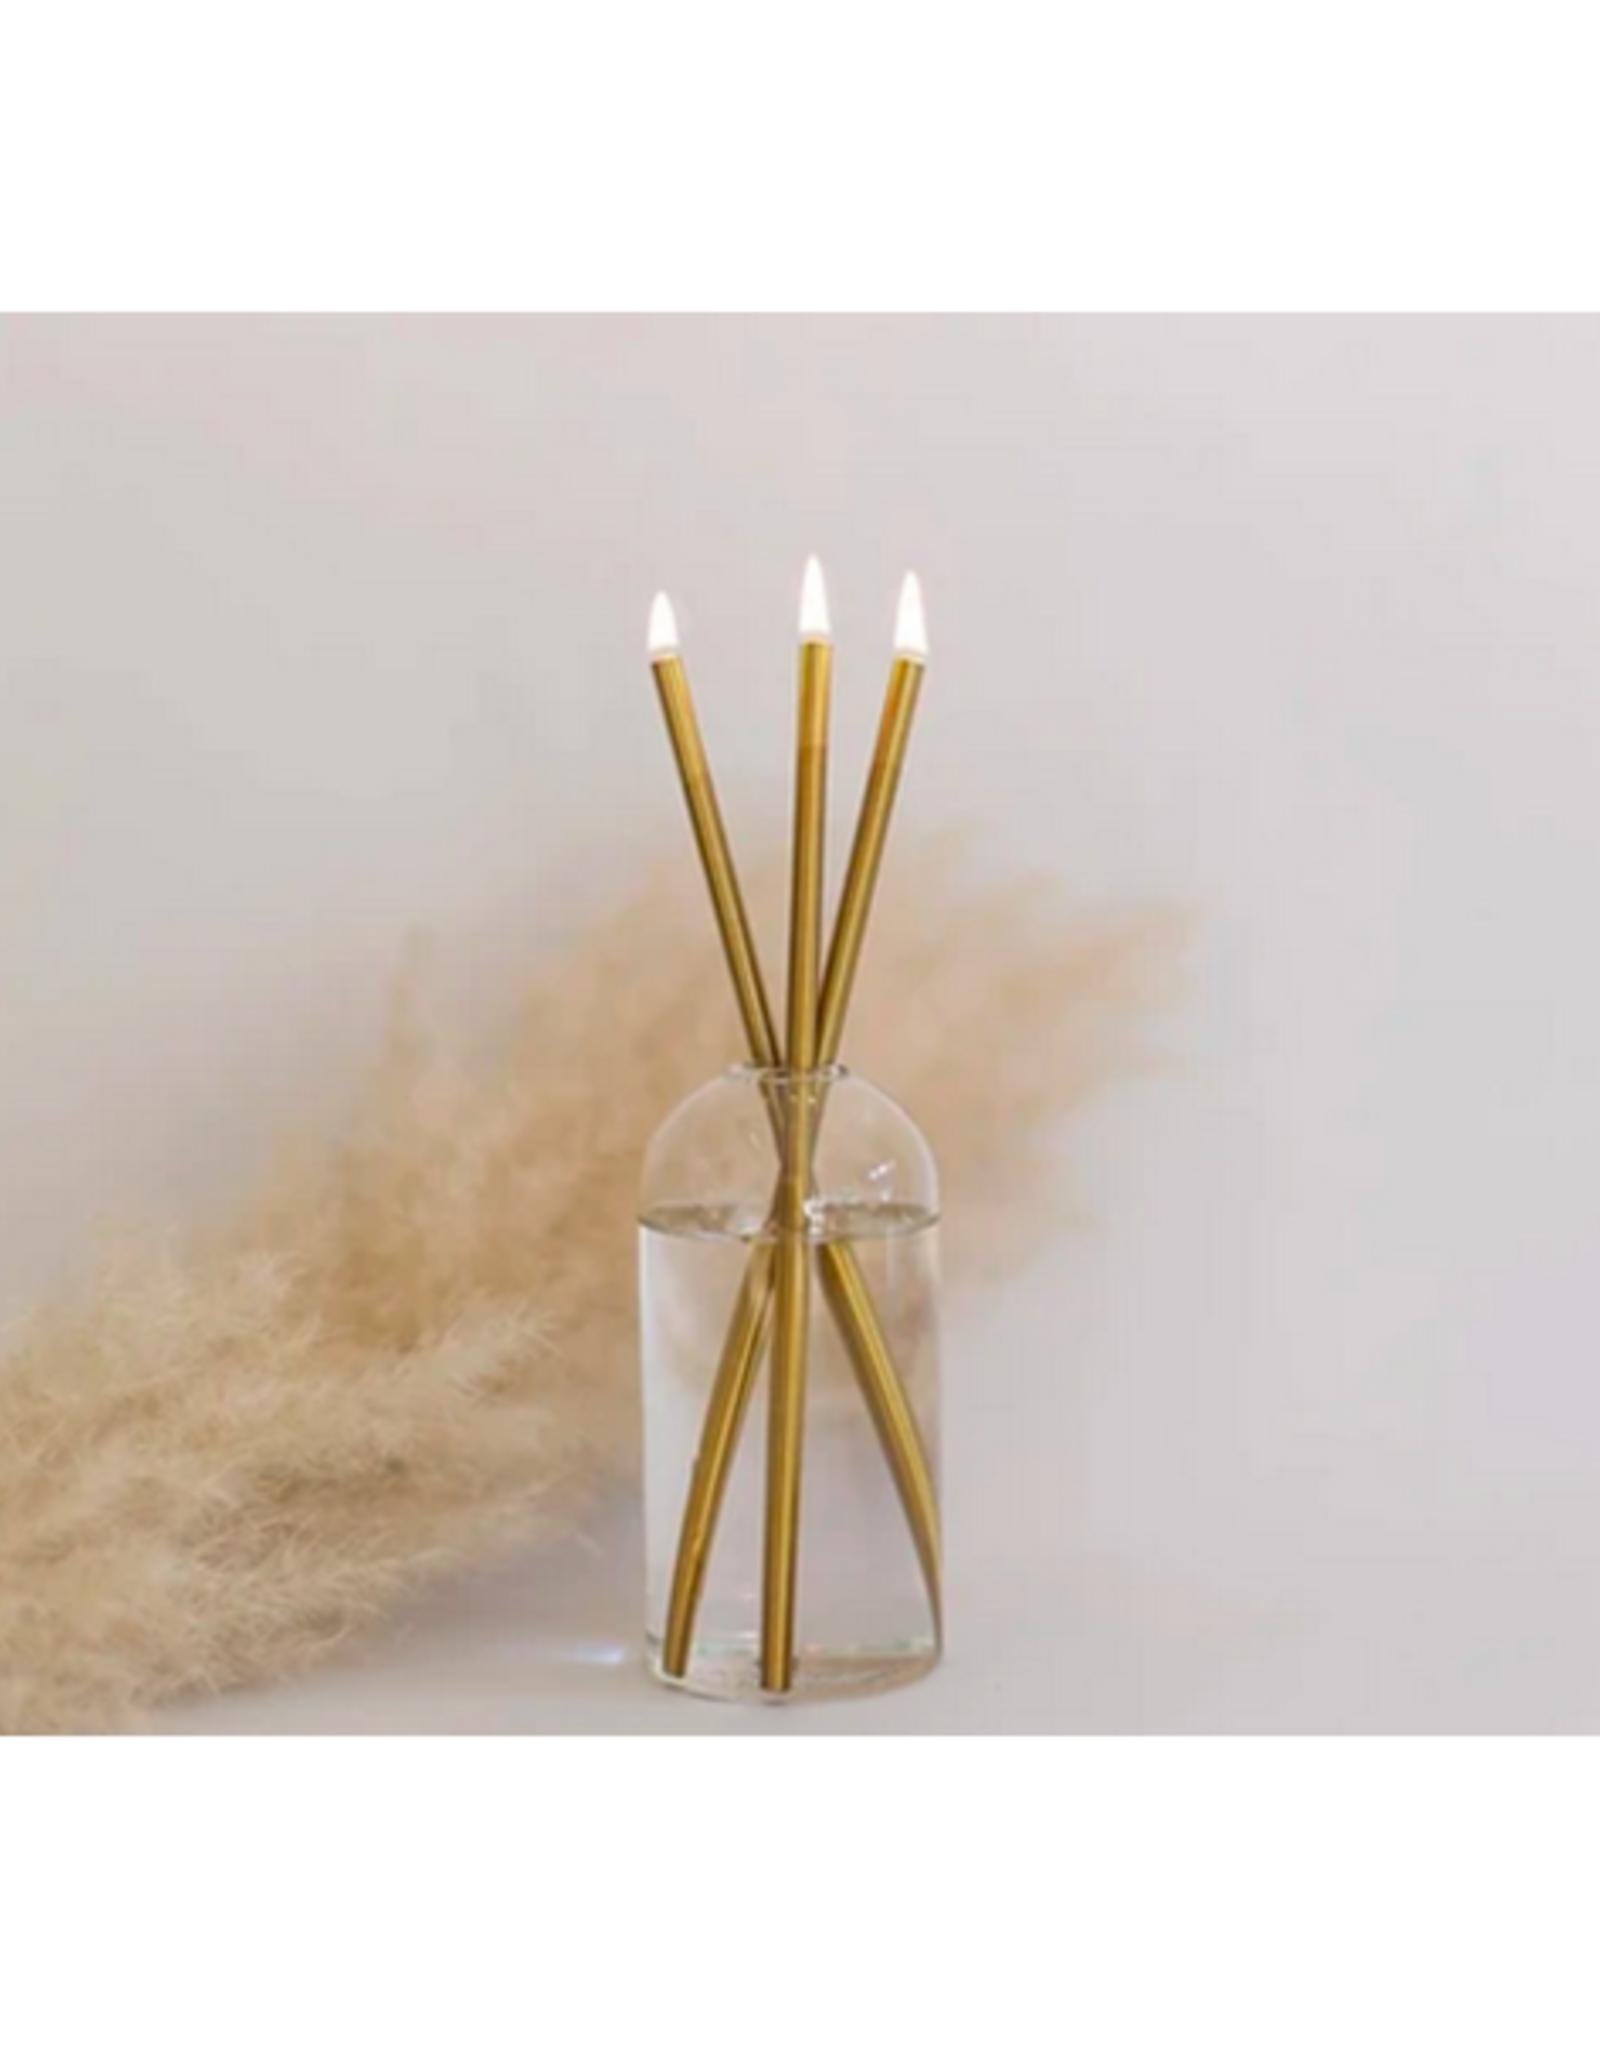 ENG - Everlasting Candle Vase/Straight, 9oz